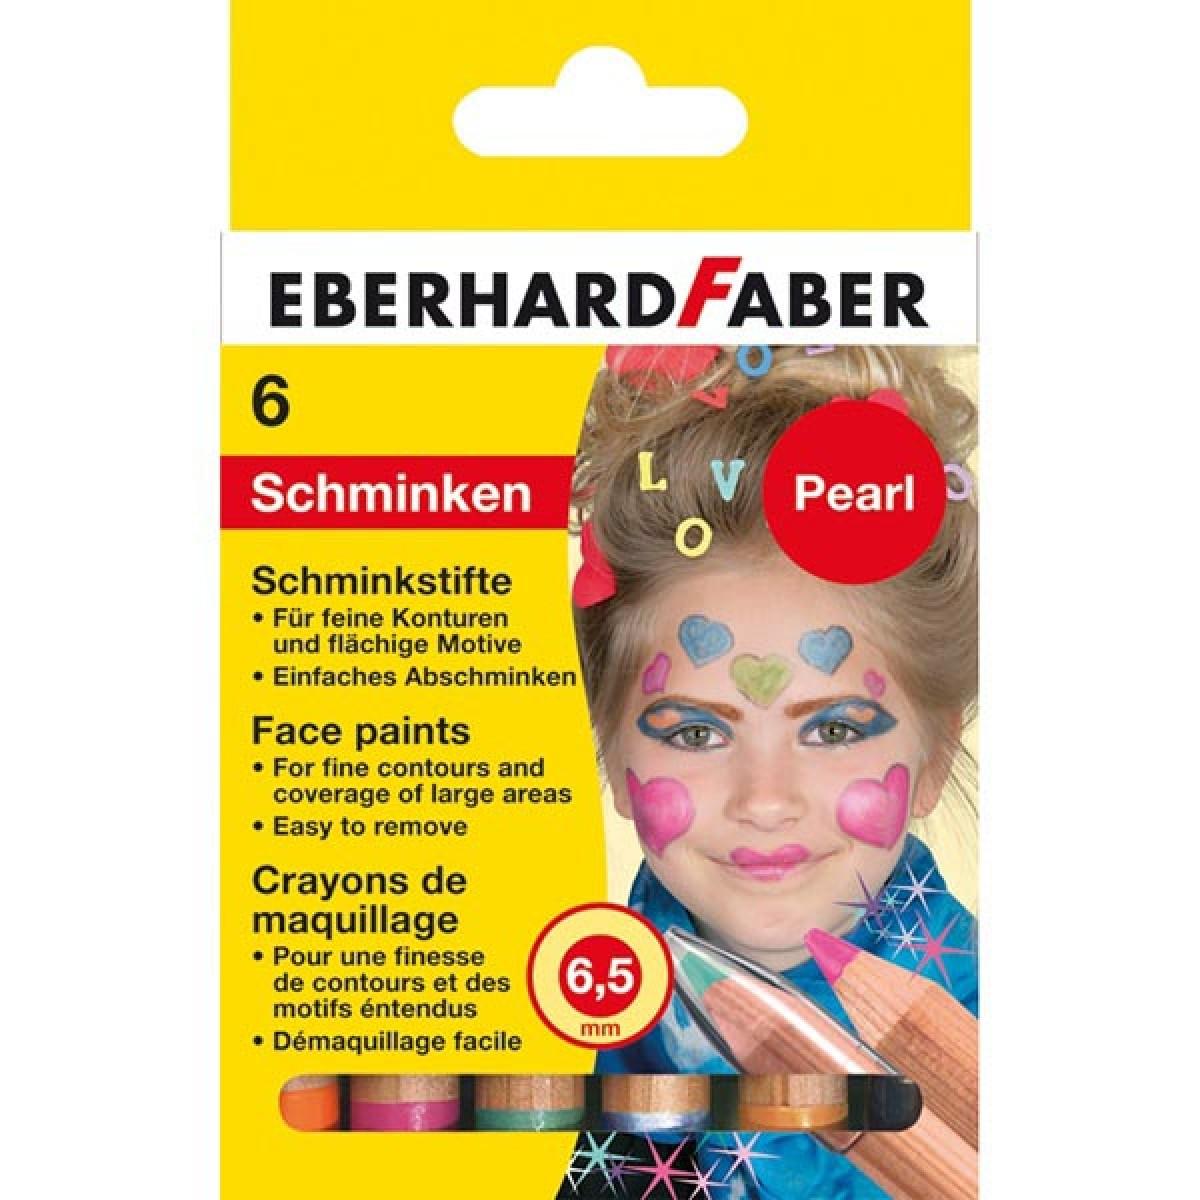 Eberhard Faber Μολύβια 6.5mm Για Το Πρόσωπο Pearl (6 Τεμ.) Μπογιές για πρόσωπο